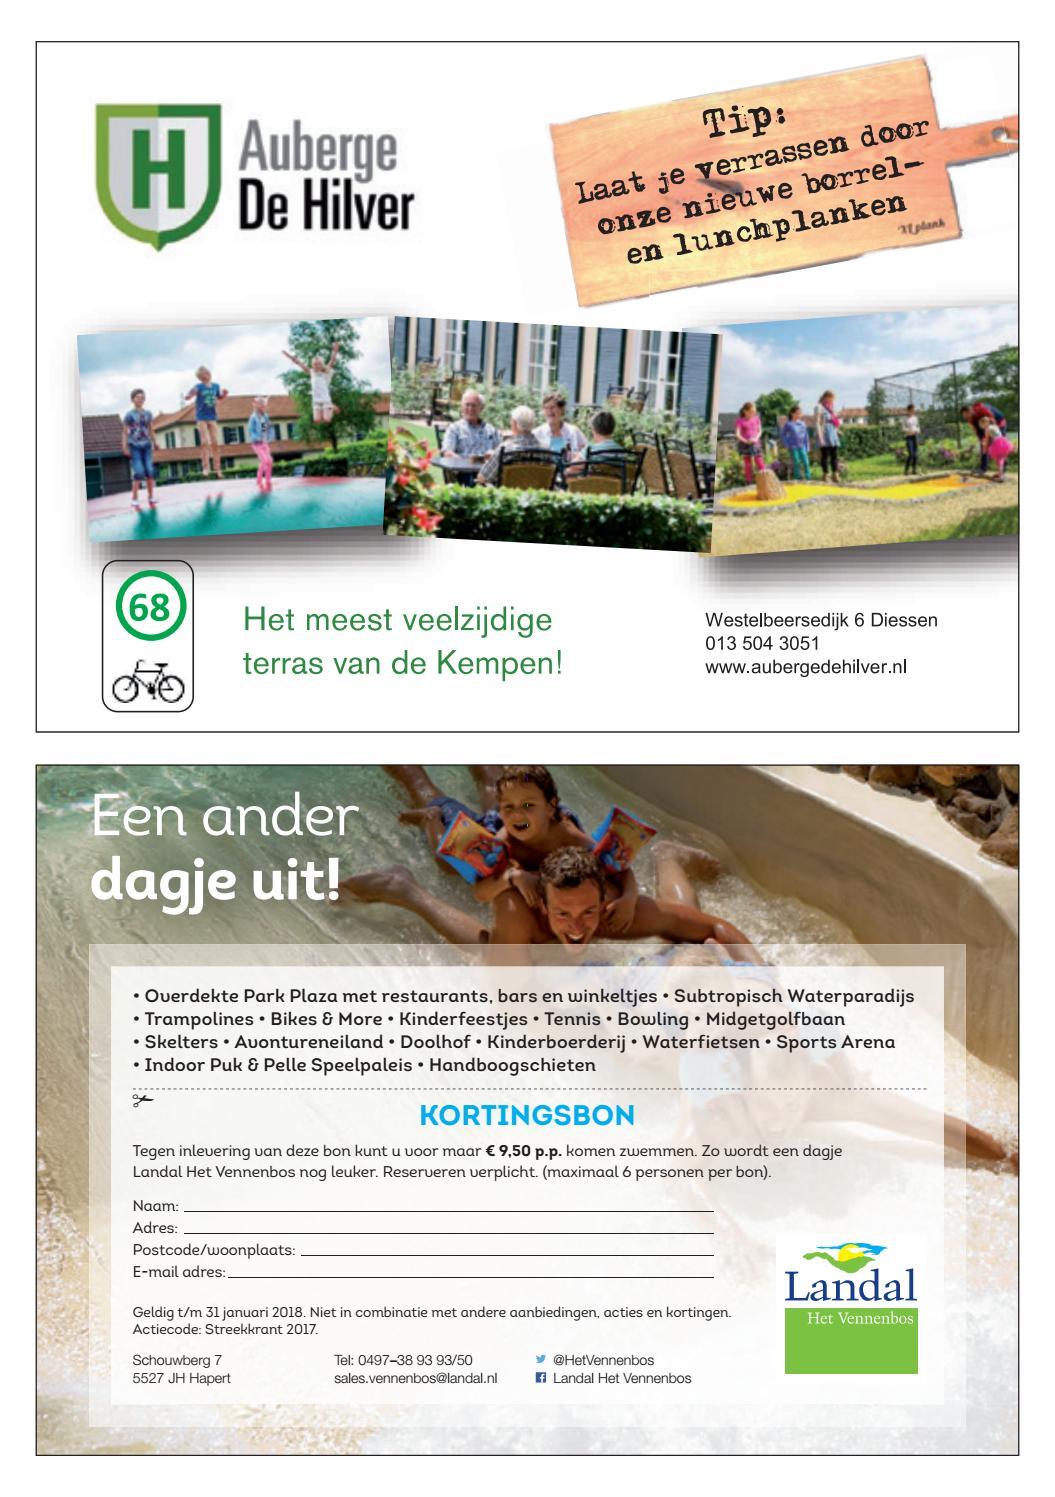 Brabantse Kempen Magazine 2017 2018 By Content Magazine Issuu